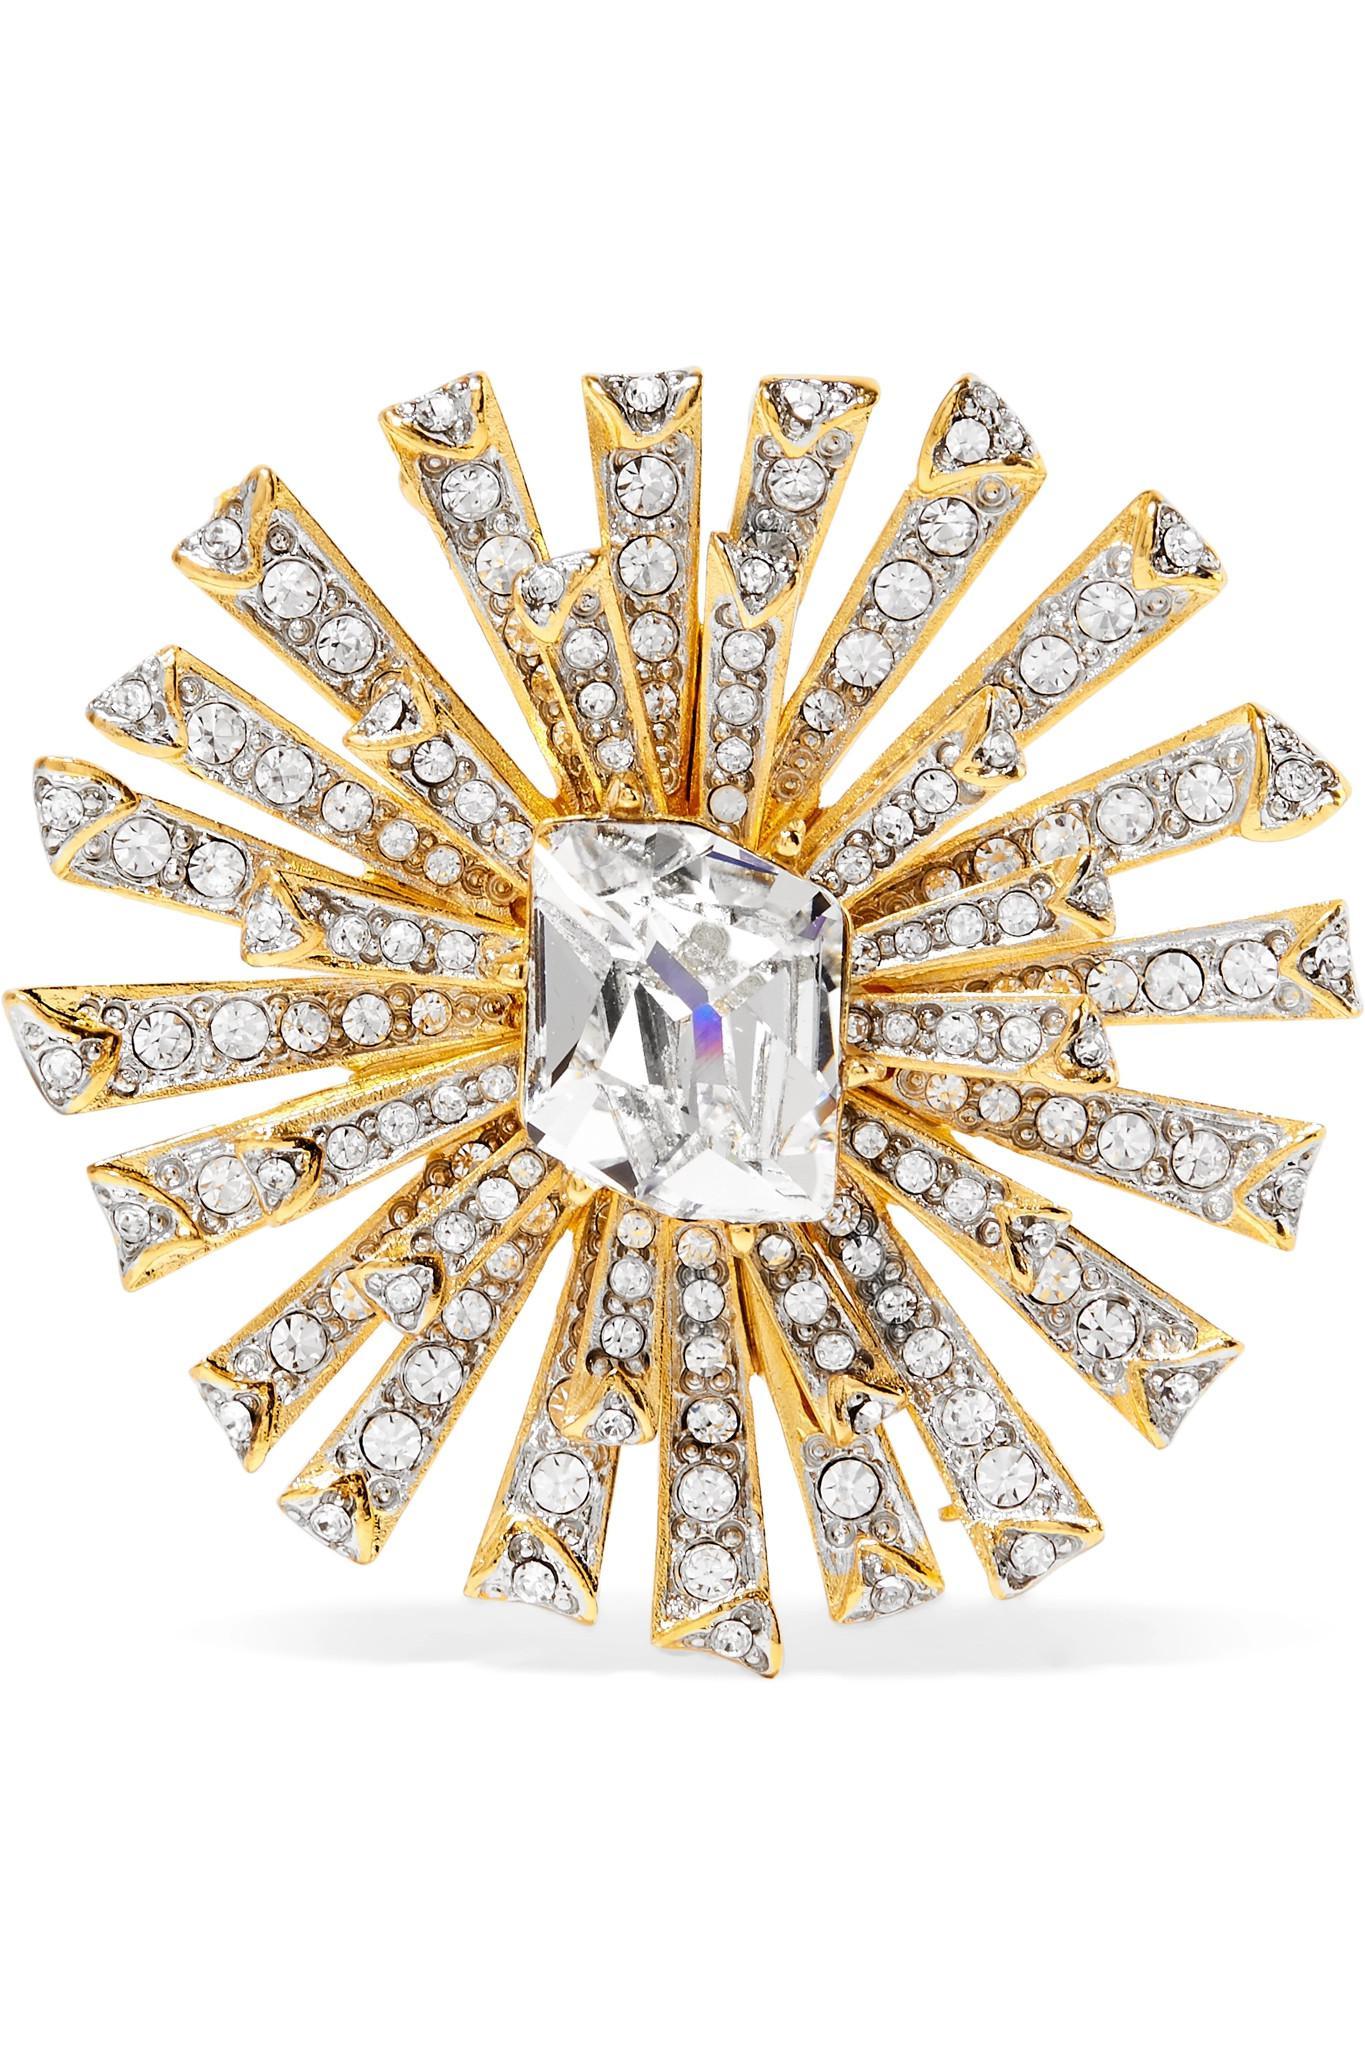 Kenneth Jay Lane Silver Crystal Starburst With Crystal Center Pin GcXeNI7xJ